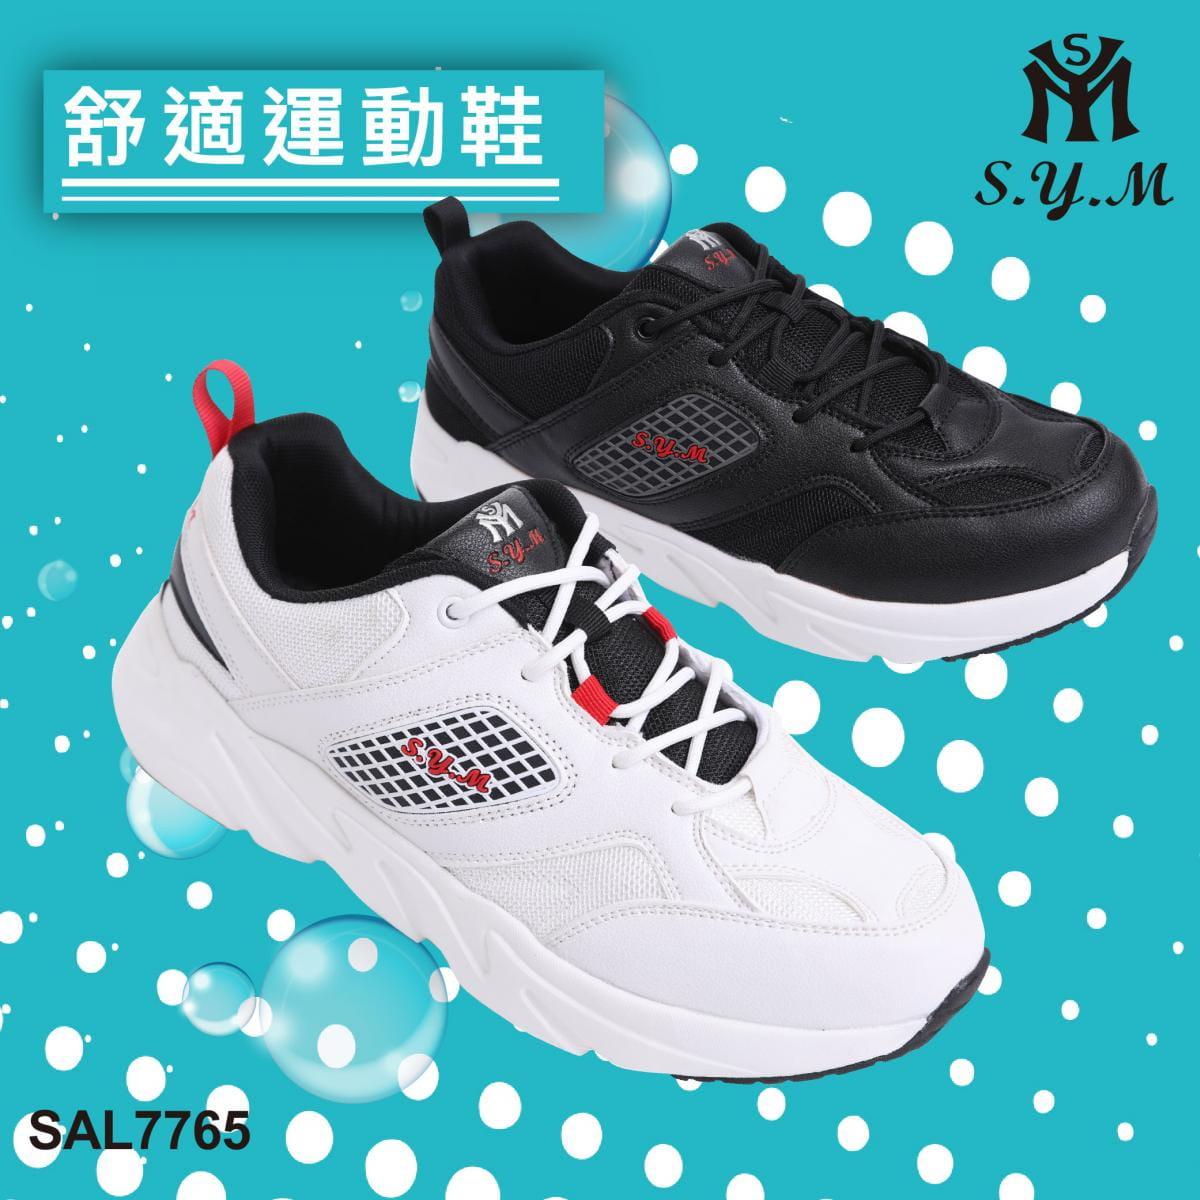 【S.Y.M】輕量簡約機能運動鞋